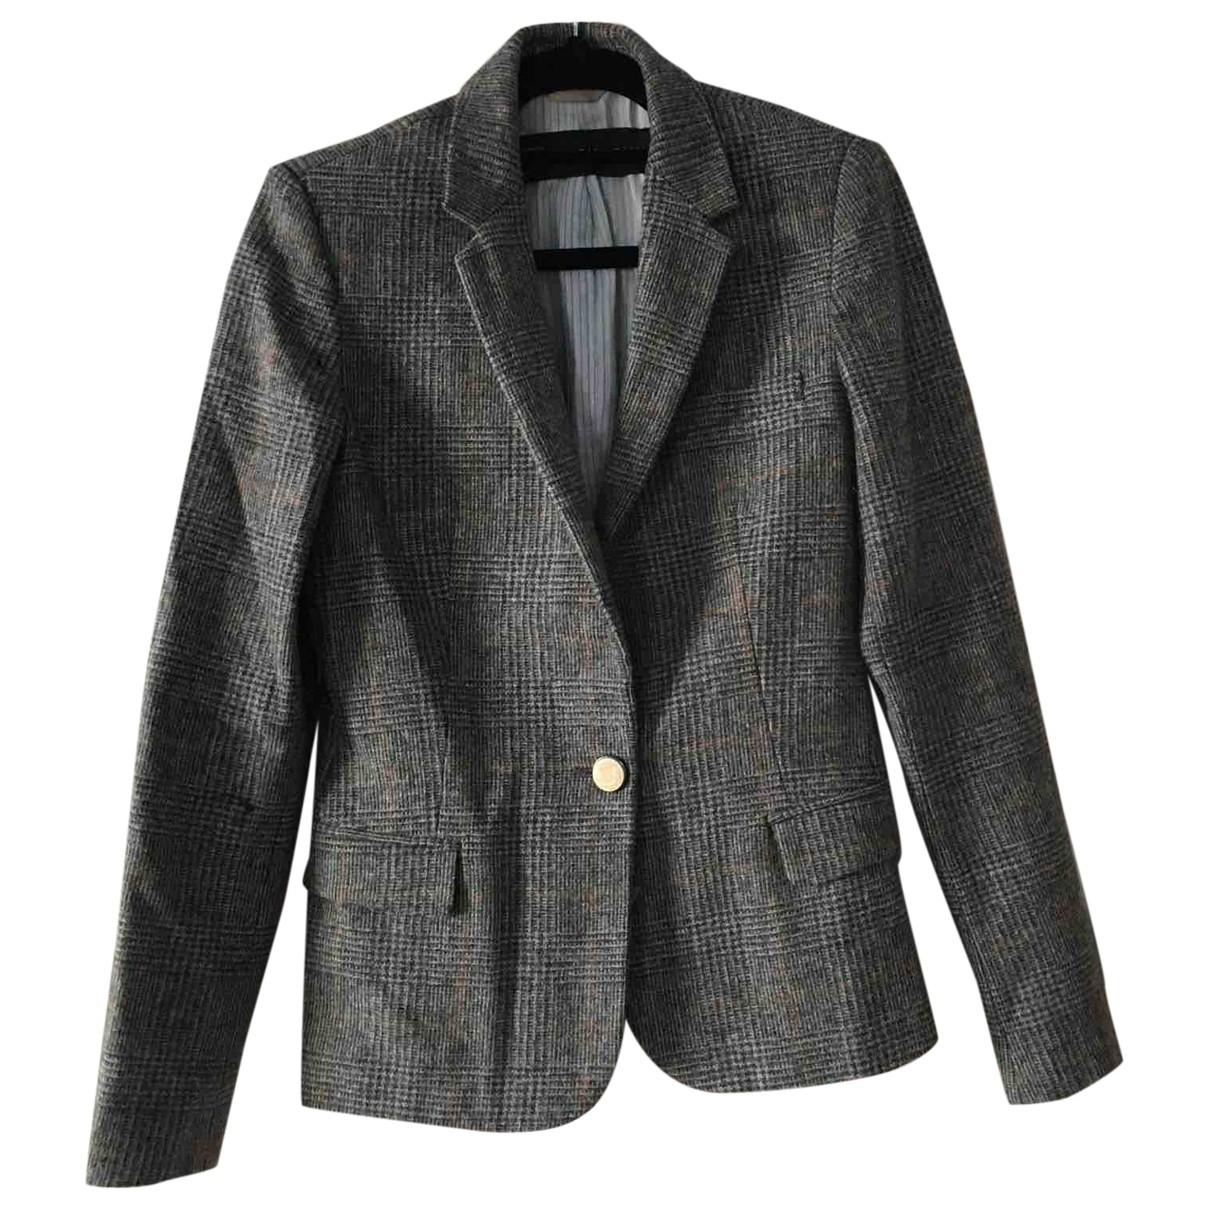 Zara \N Jacke in  Braun Wolle